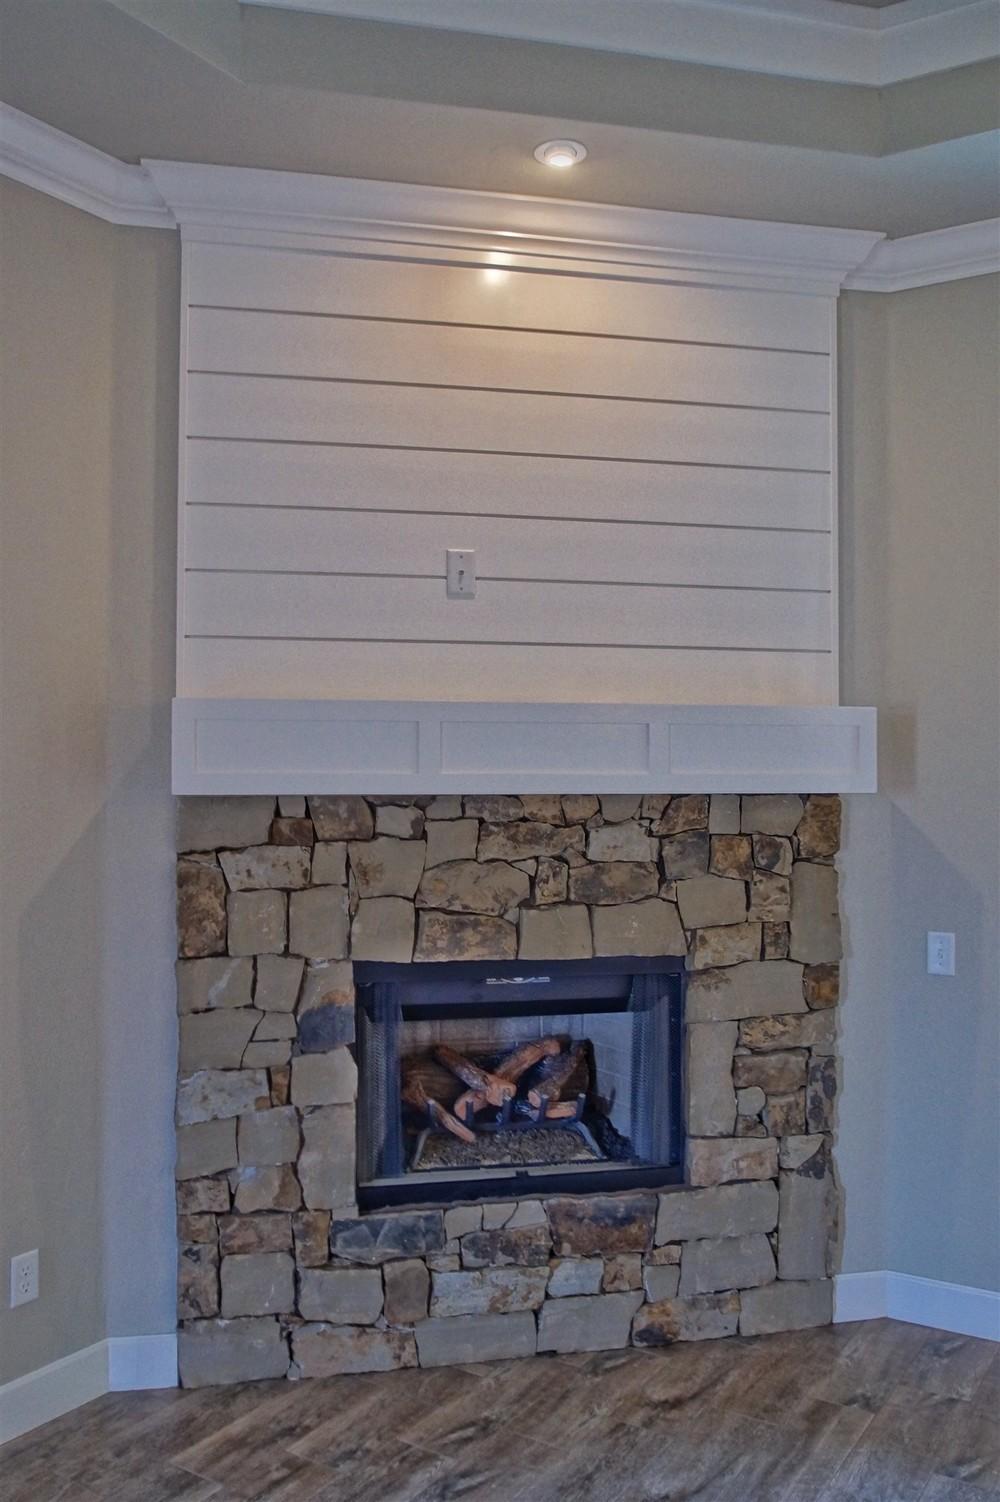 14 - Fireplace.jpg